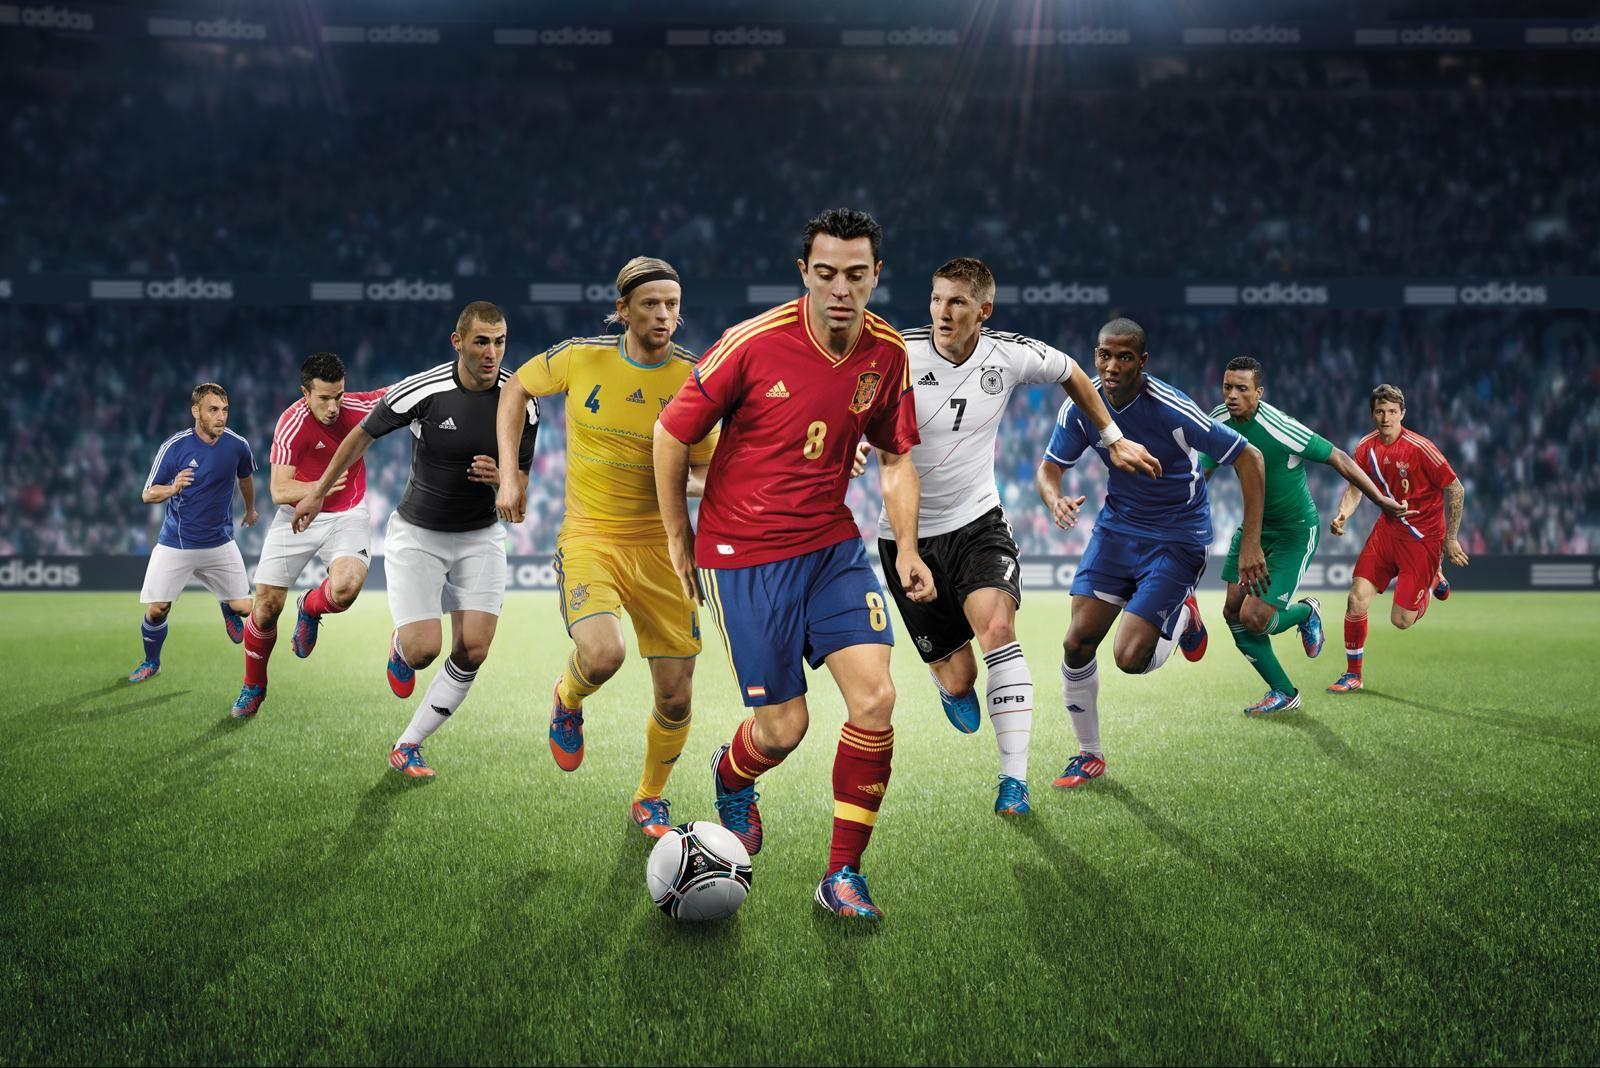 Wallpapermisc Famous Football Players Hd Wallpaper 21 1600 X